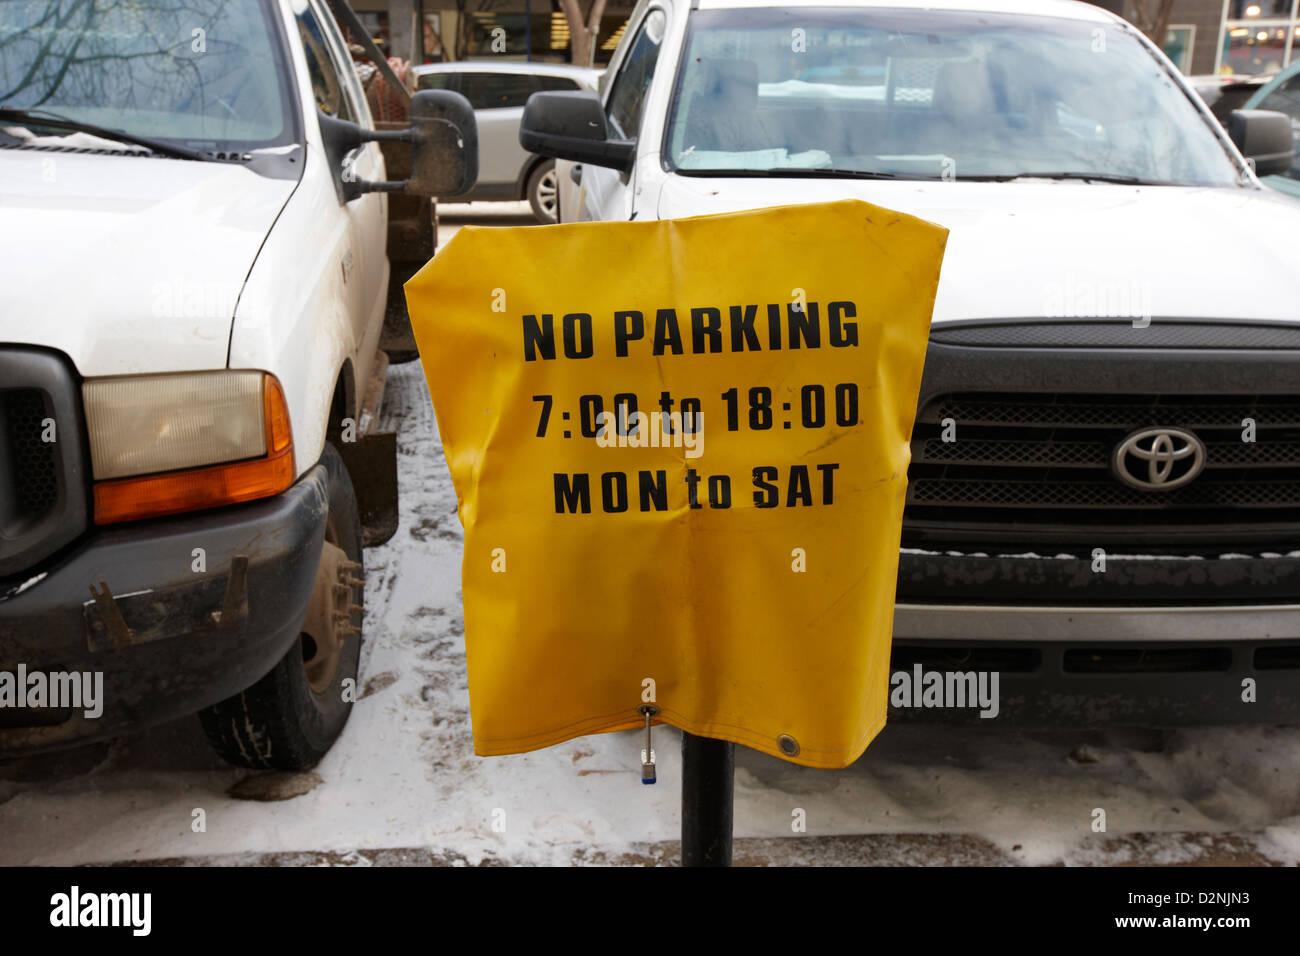 cars parked beside no parking cover on a parking meter during winter Saskatoon Saskatchewan Canada - Stock Image